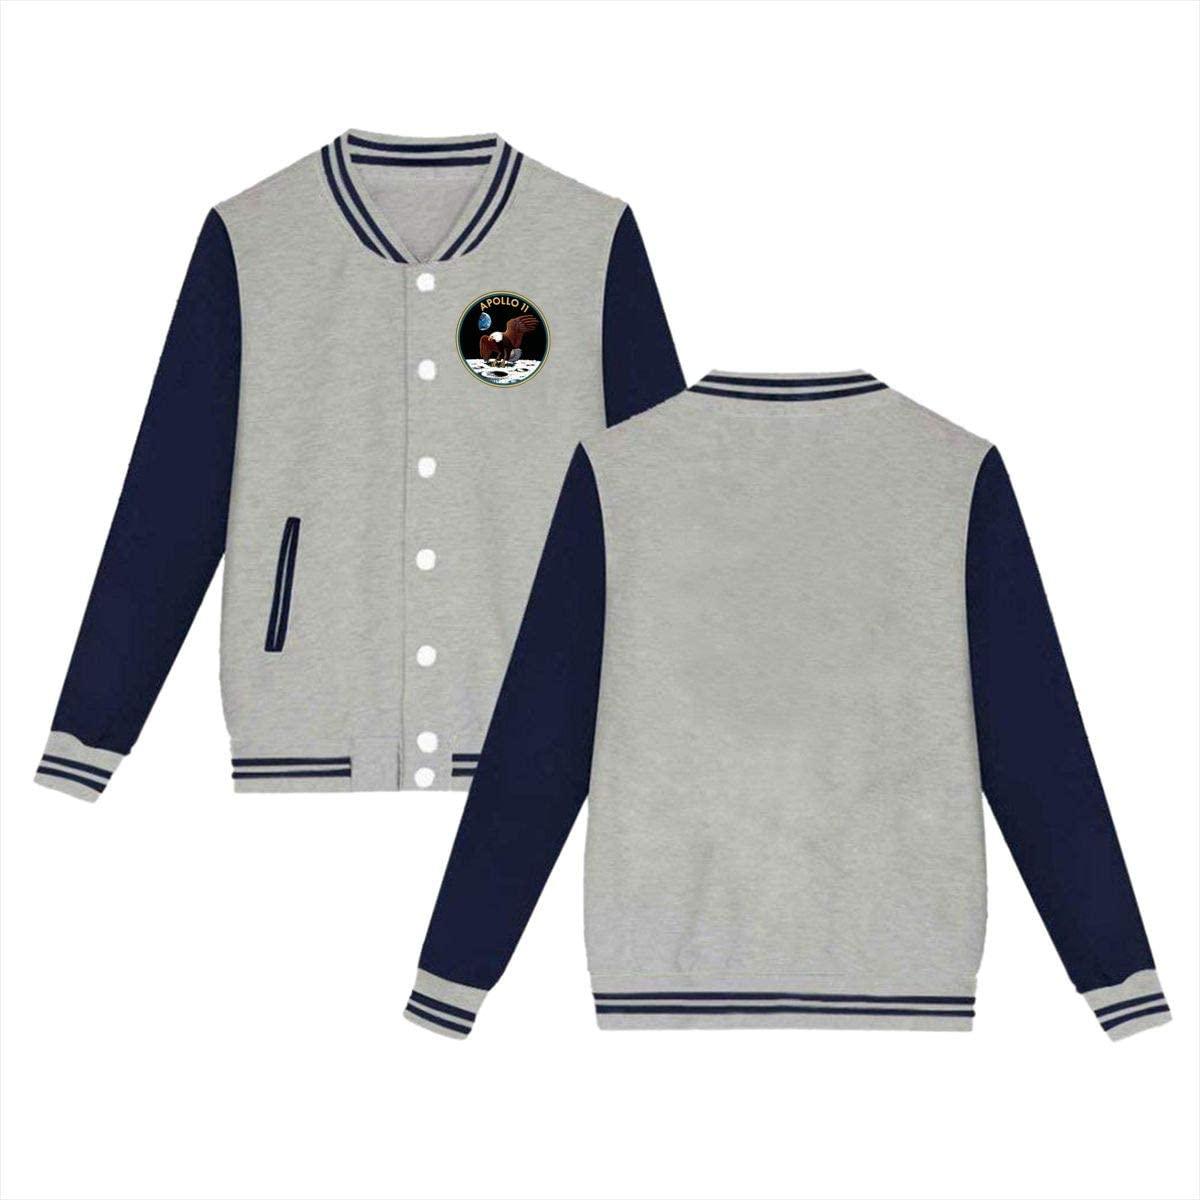 Mens Womens Baseball Uniform Jacket Sport Coat Sky-Apollo 11 Cotton Sweater